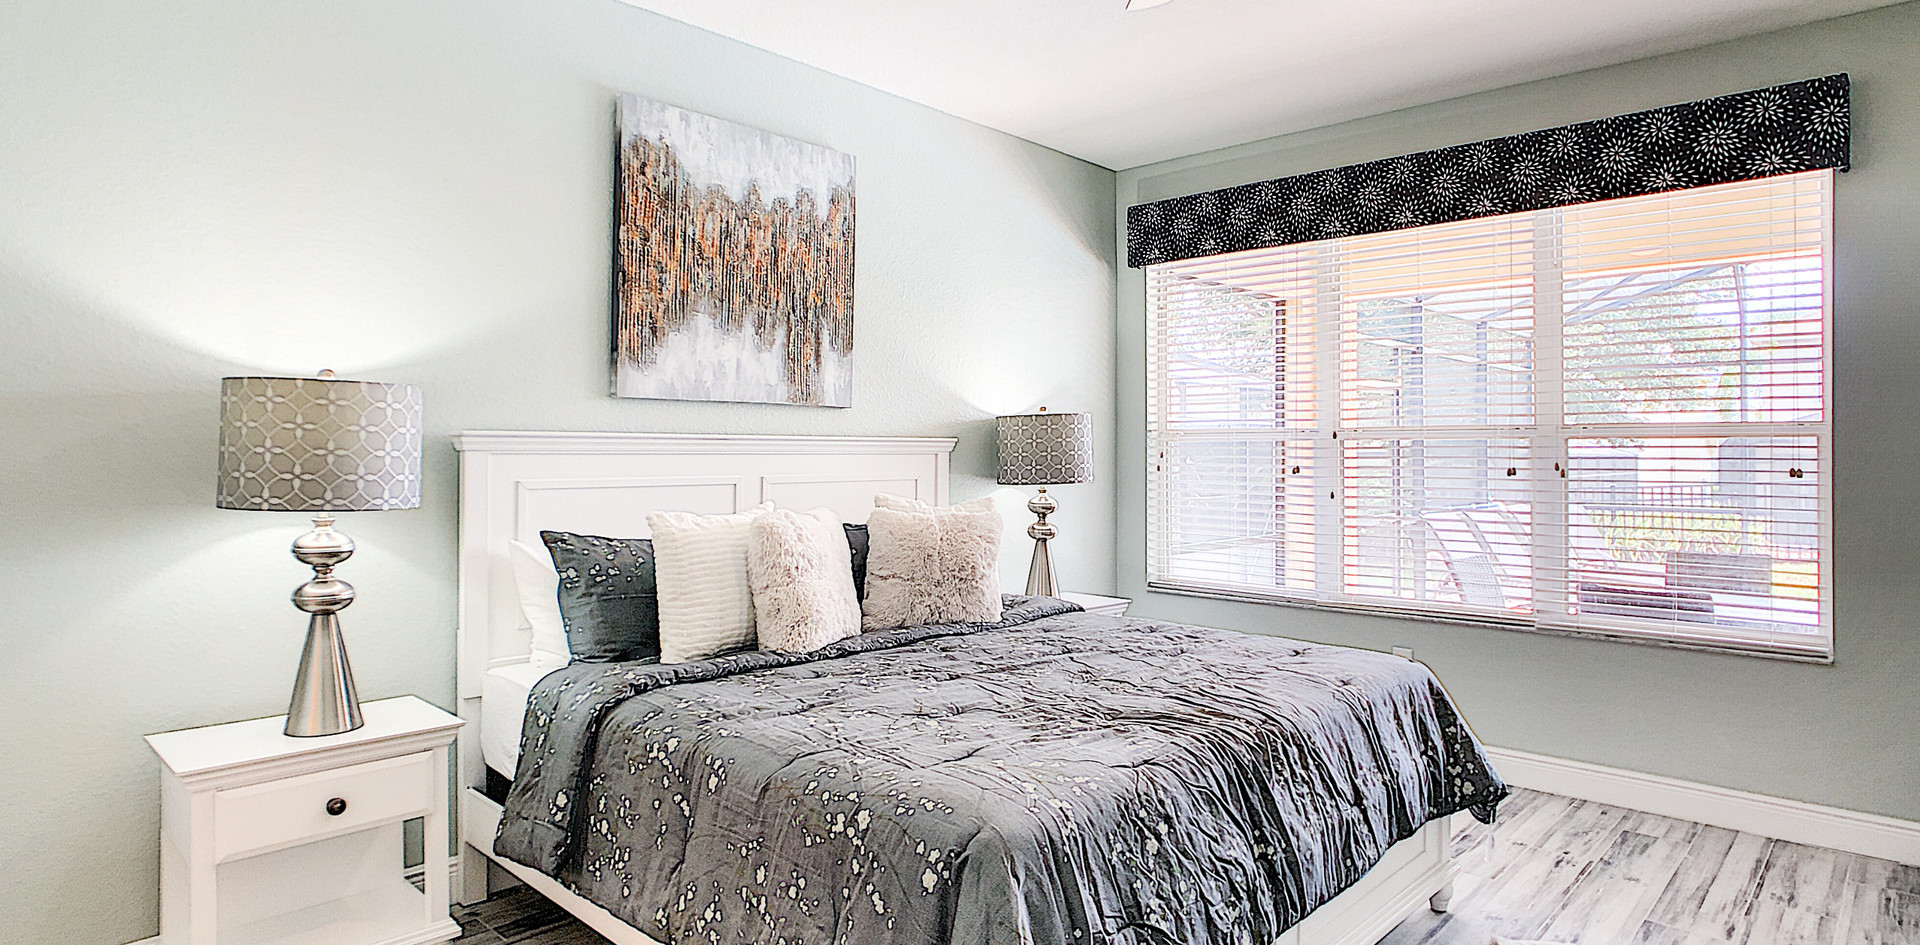 Lily Pad - Serene Bedroom